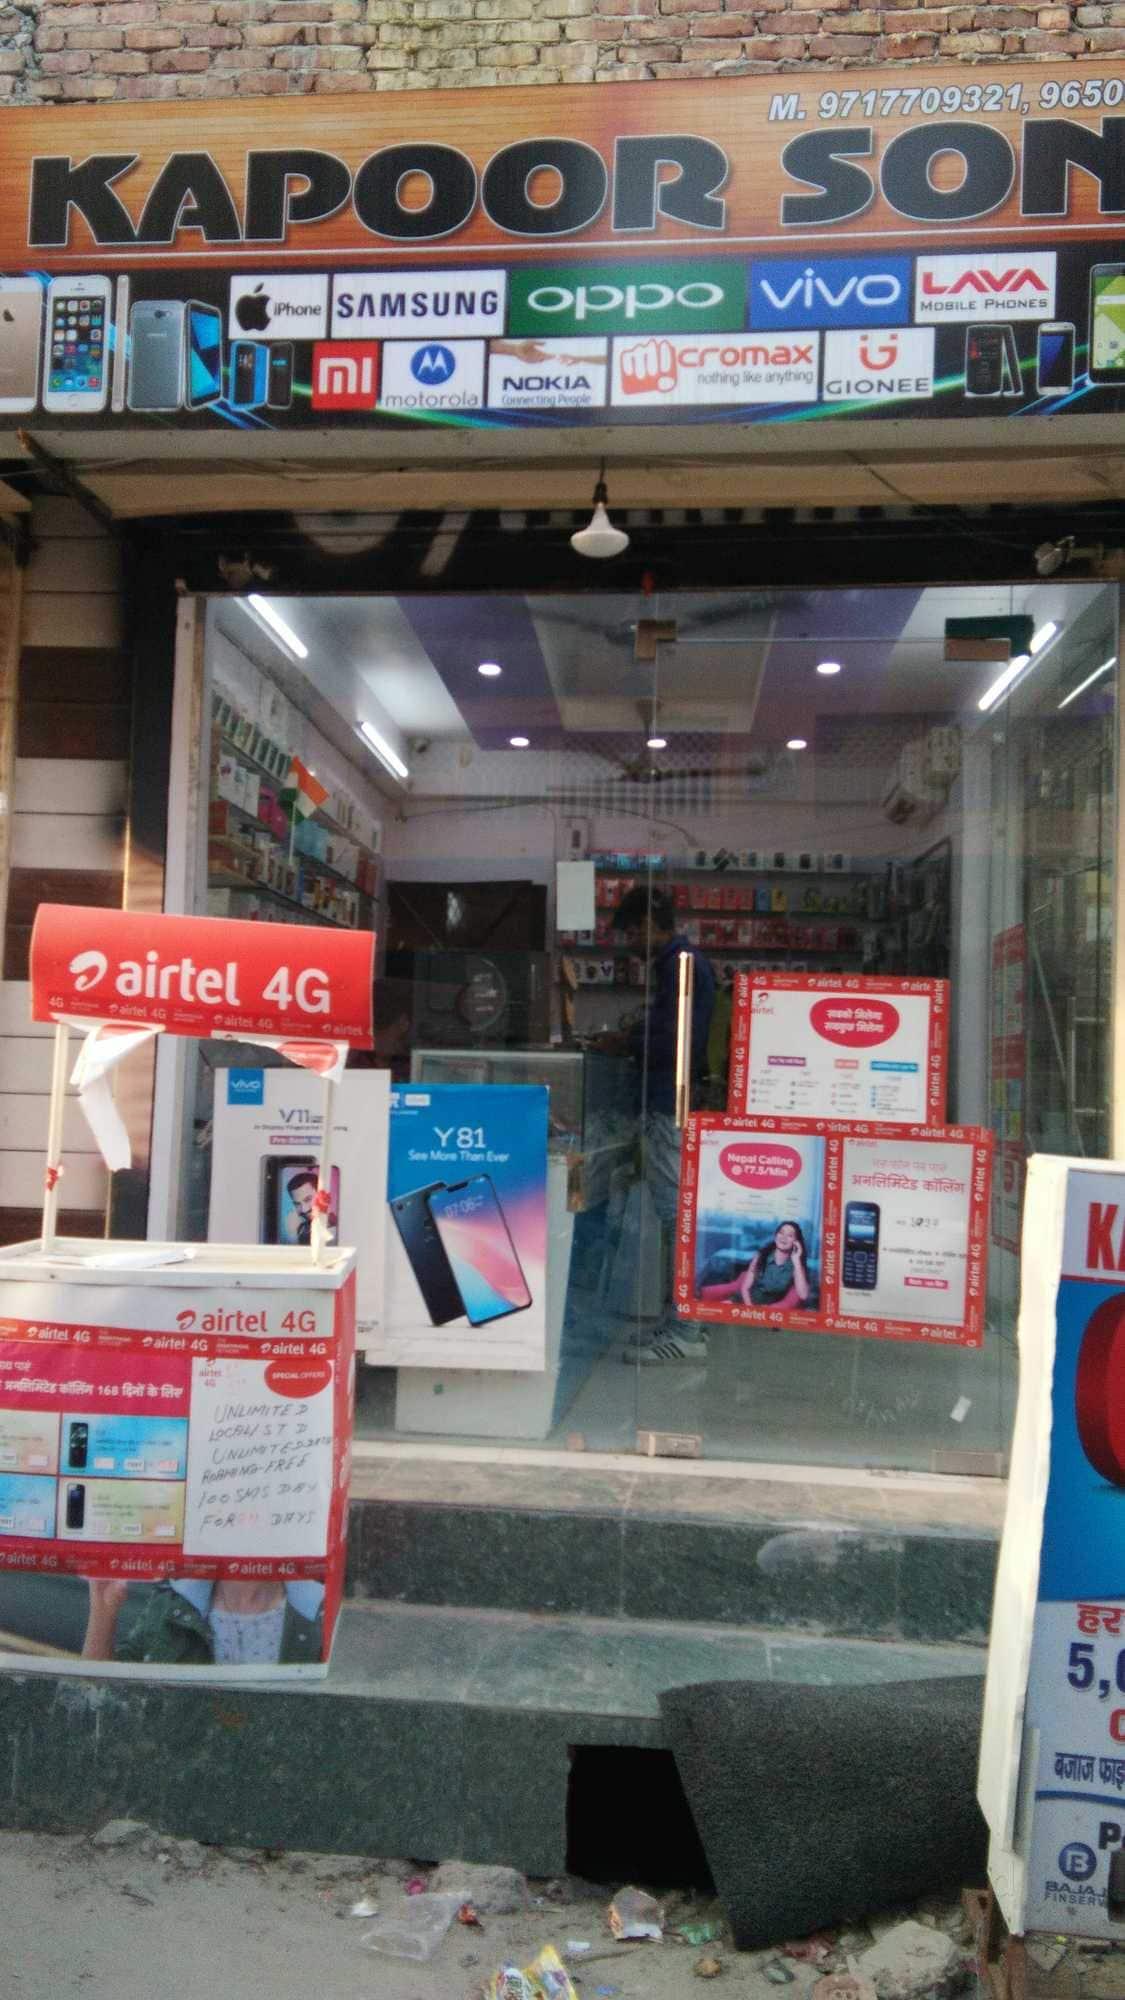 Top 100 Virgin Mobile Phone Simcard Dealers in Uttam Nagar